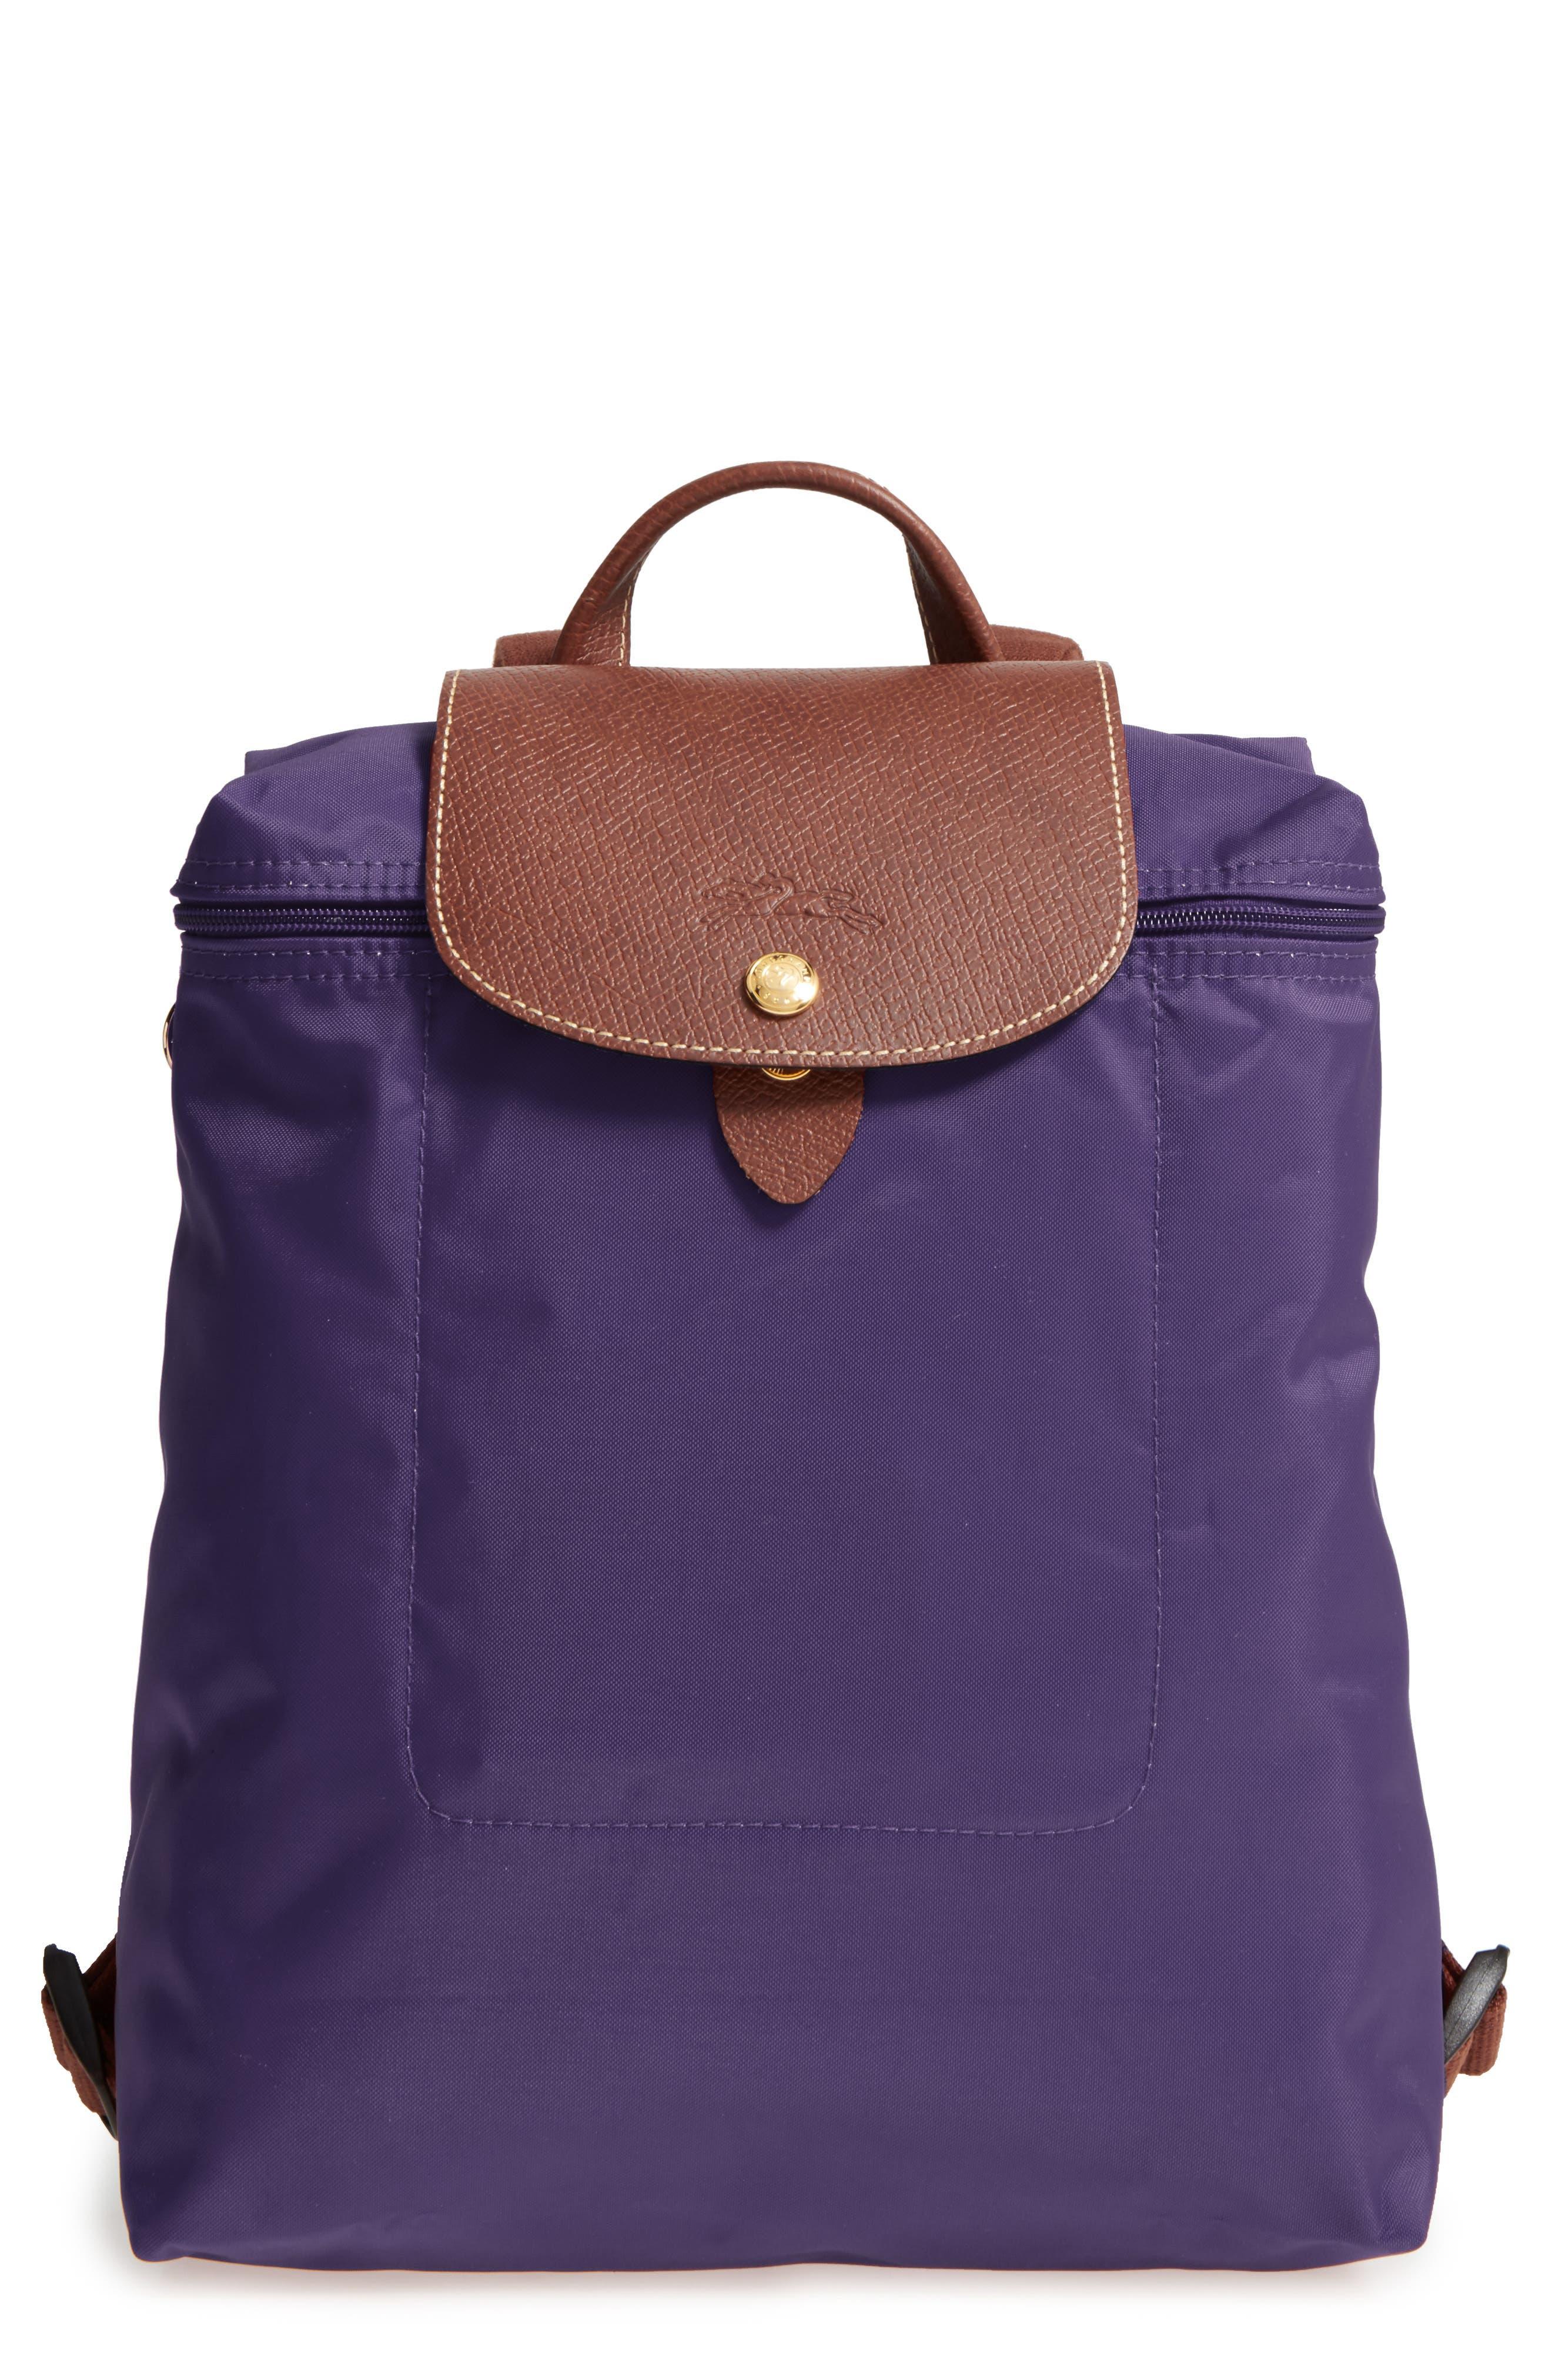 Main Image - Longchamp 'Le Pliage' Backpack